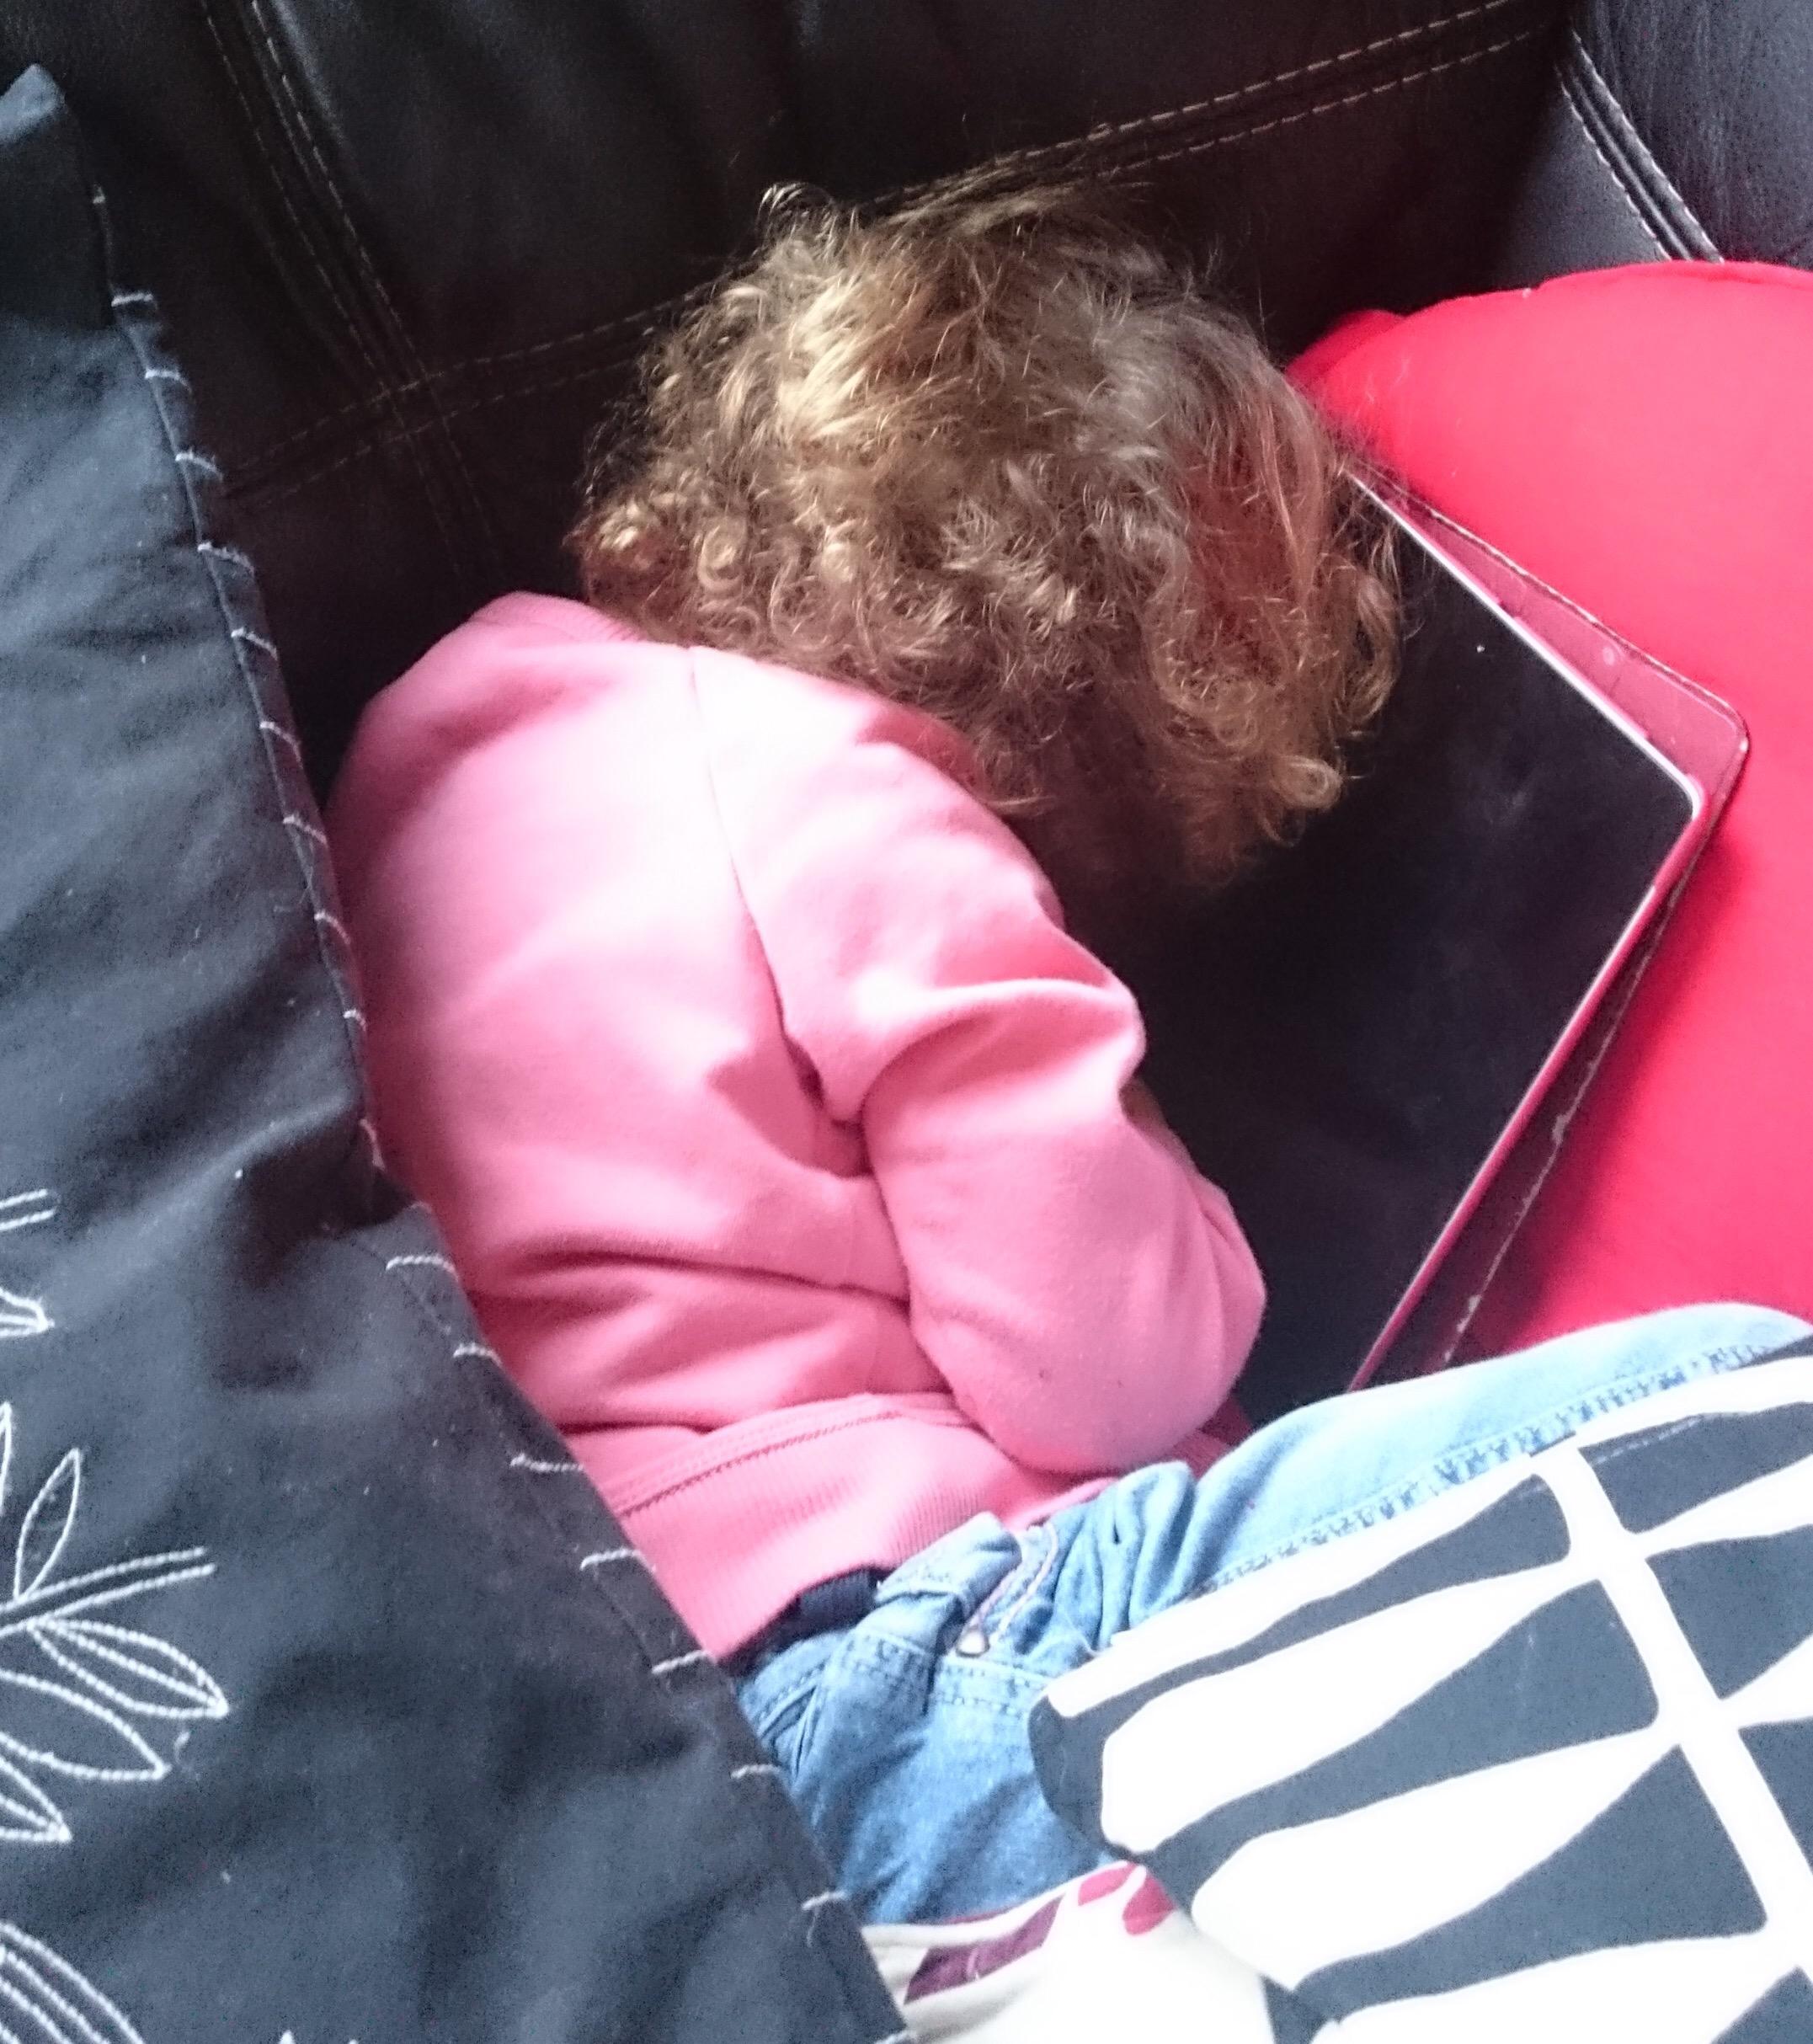 Girlbug asleep on the sofa